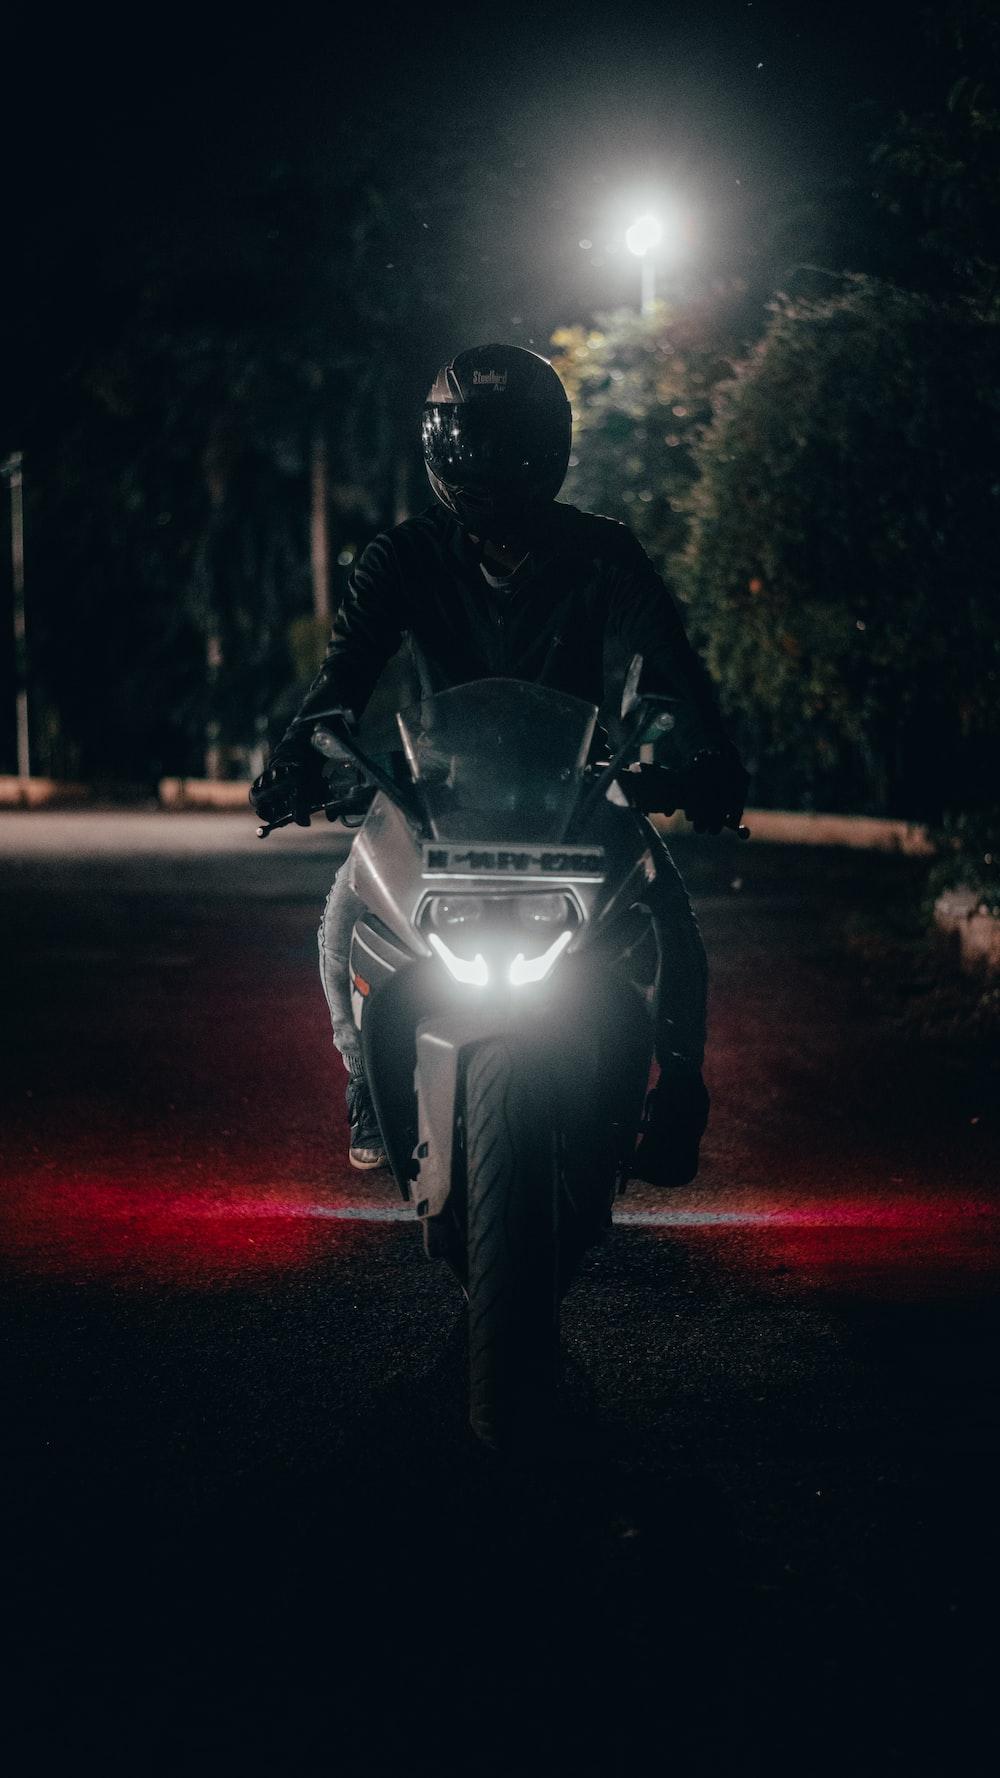 man in black jacket riding on motorcycle during night time